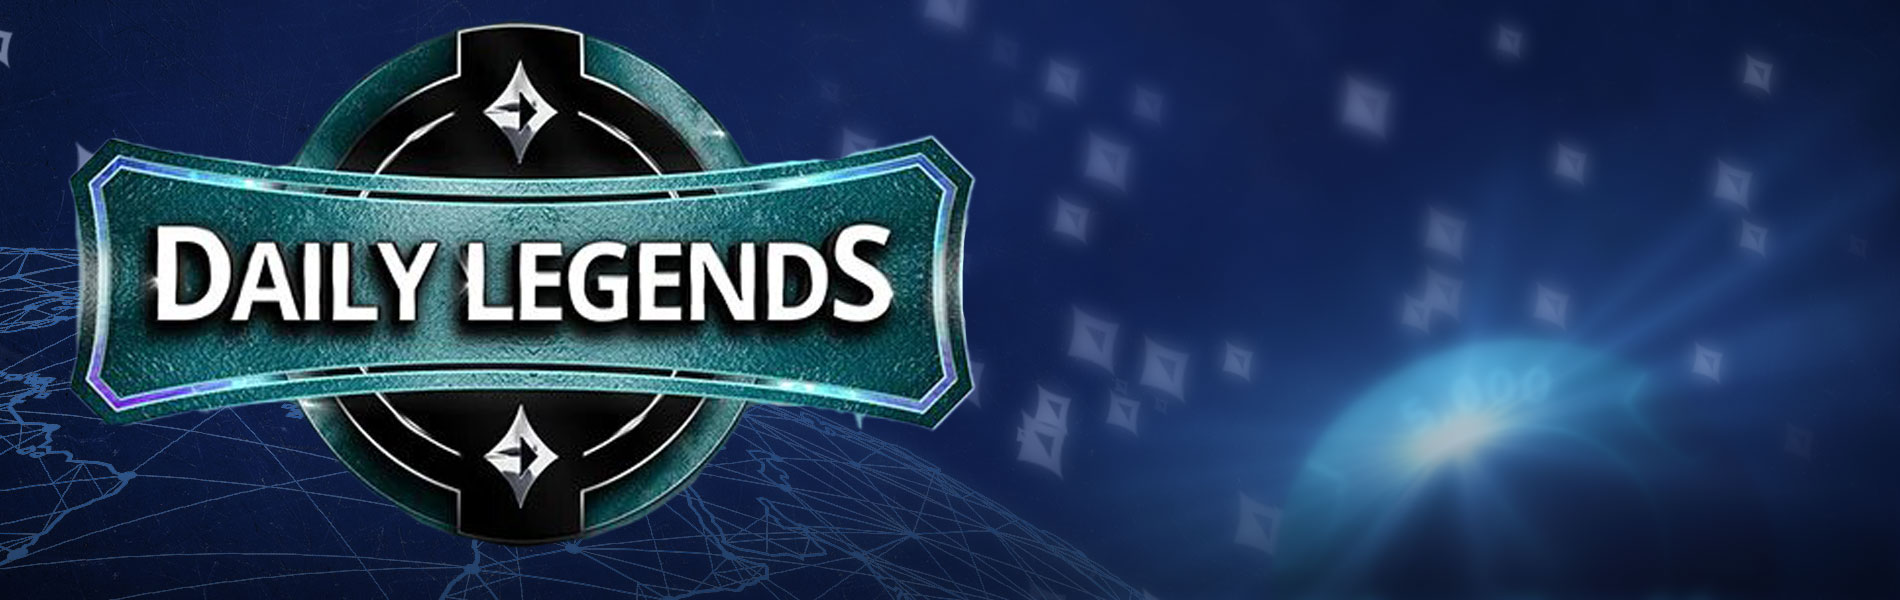 Турнир Daily Legends в покерном руме Partypoker.